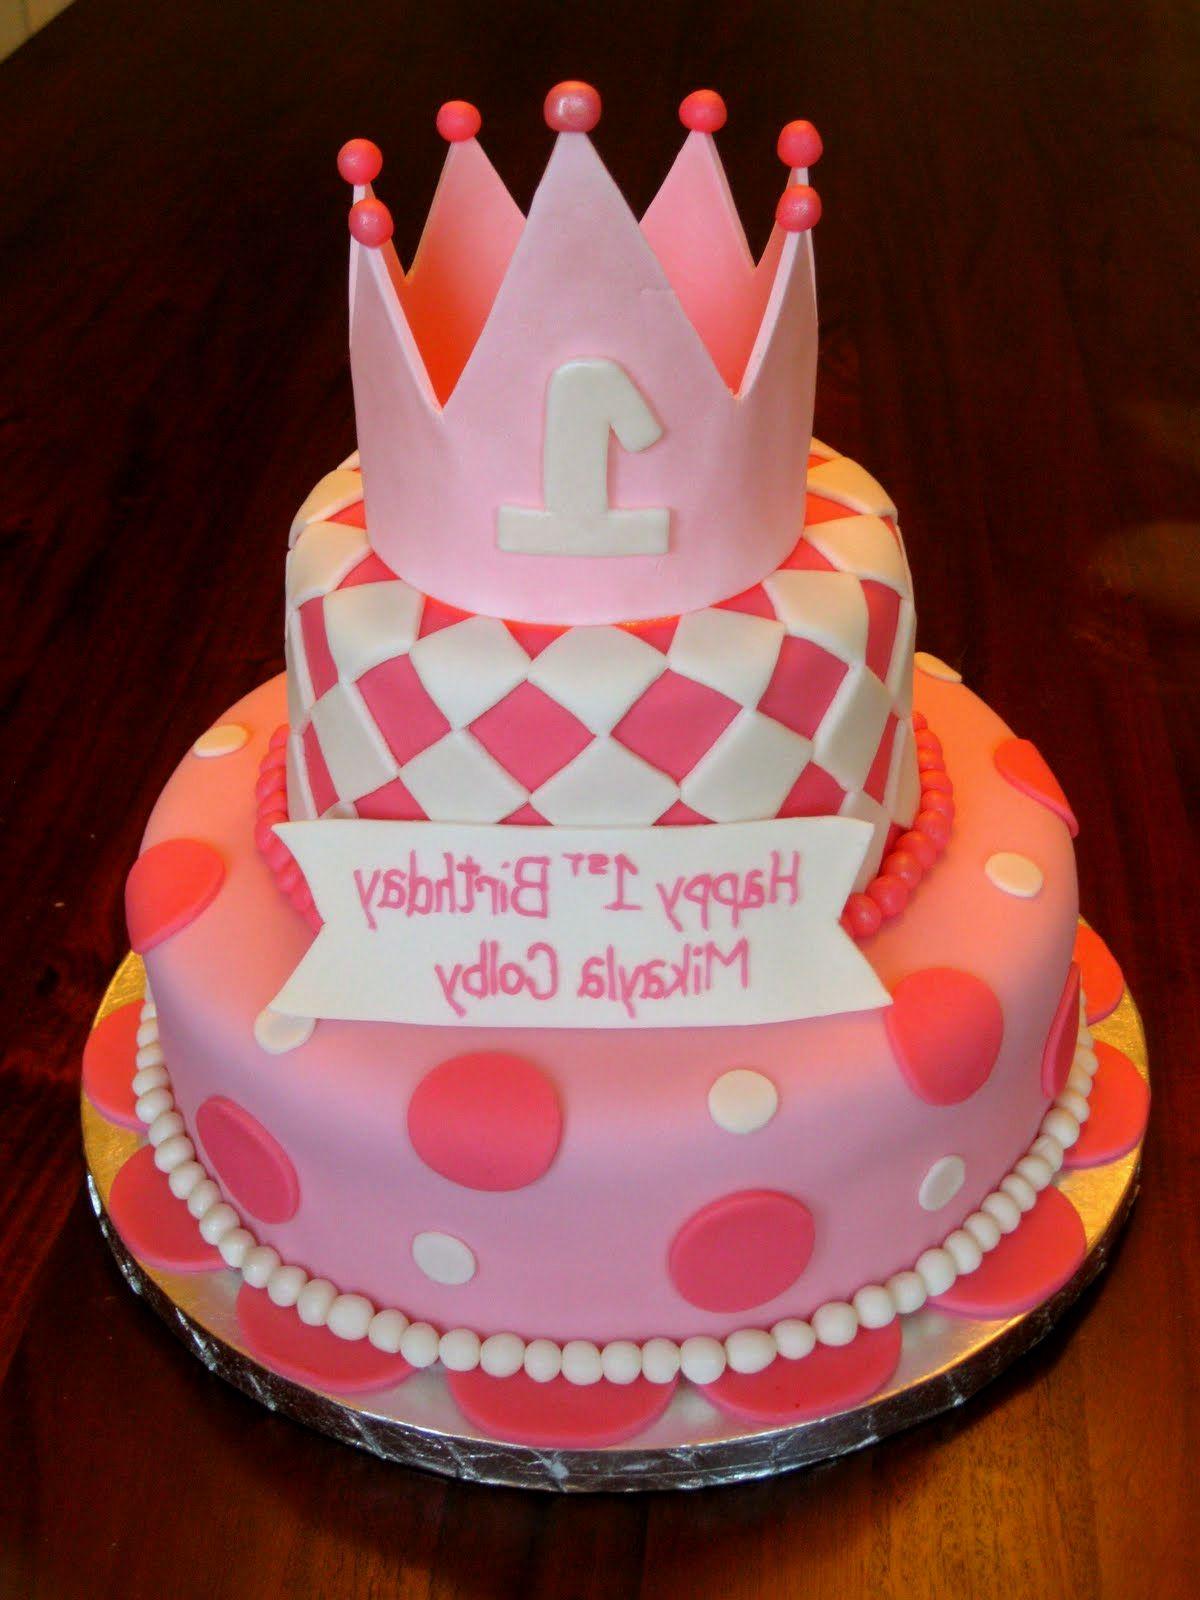 9 One Year Baby Girl Cakes Photo 1 Year Old Girl Birthday Cake 1